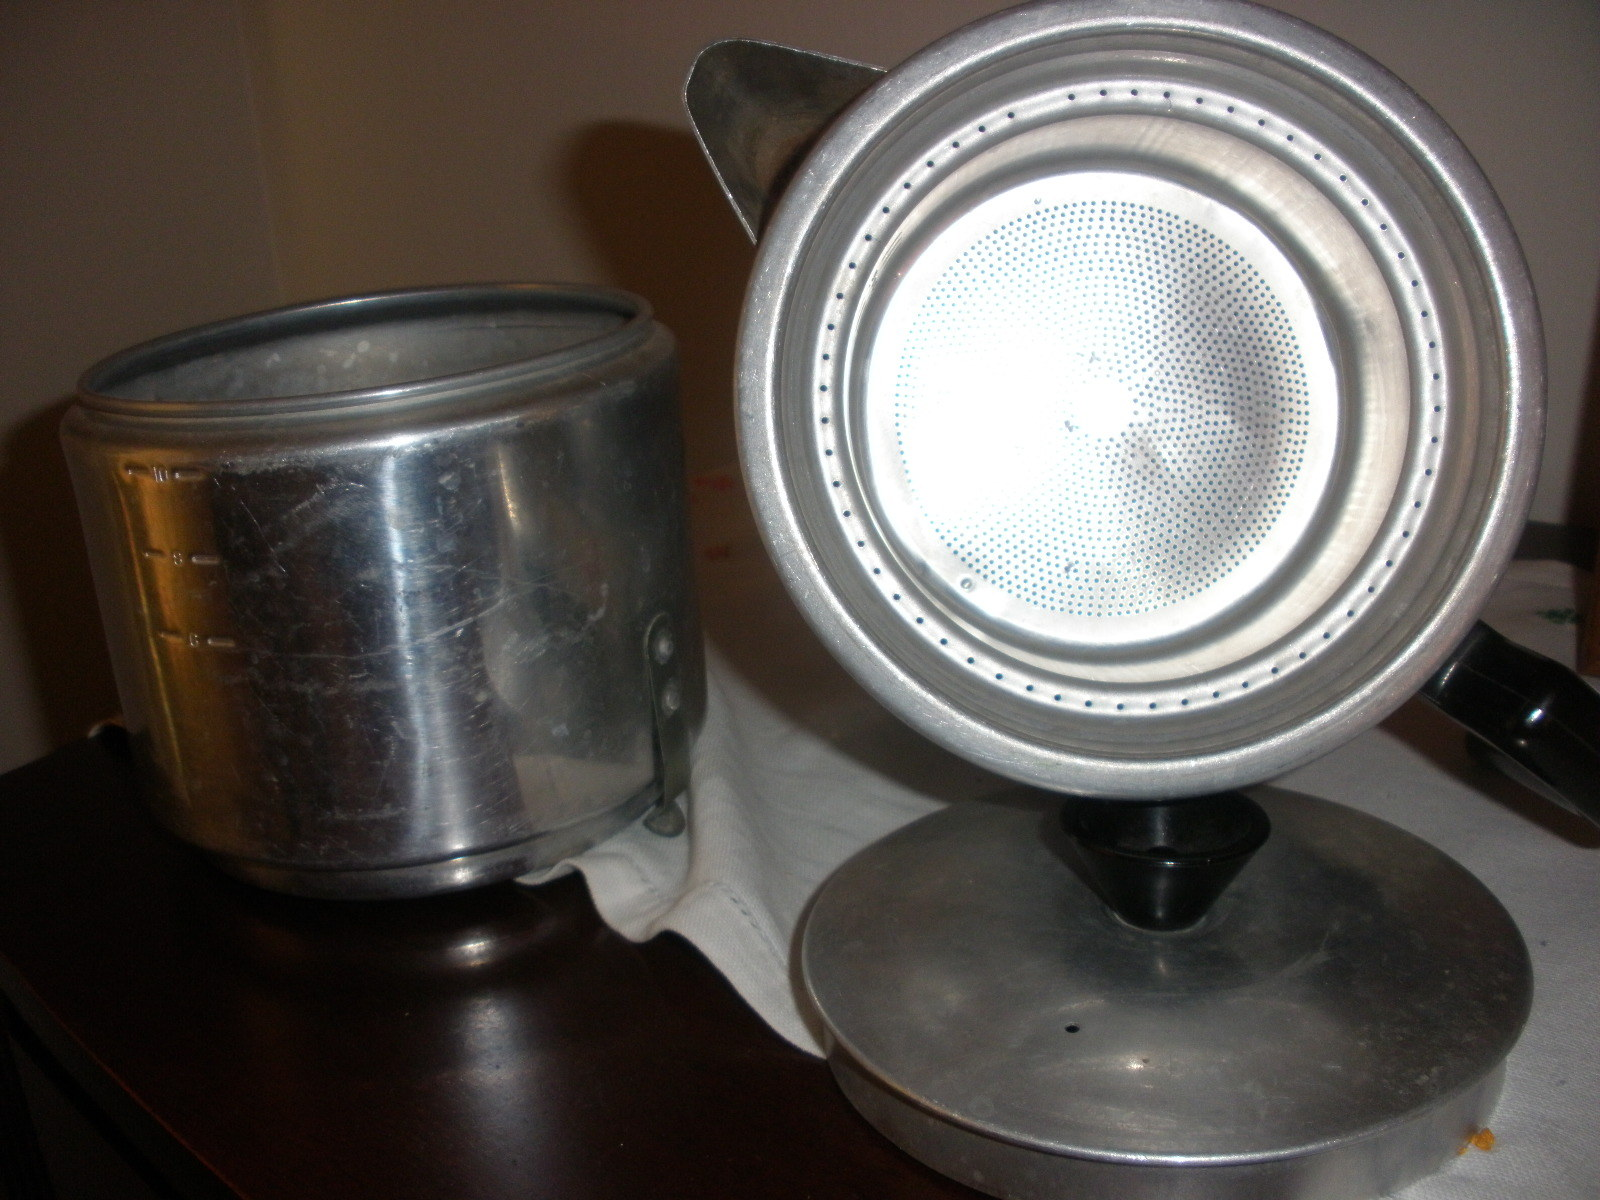 Aluminum vintage coffee pot